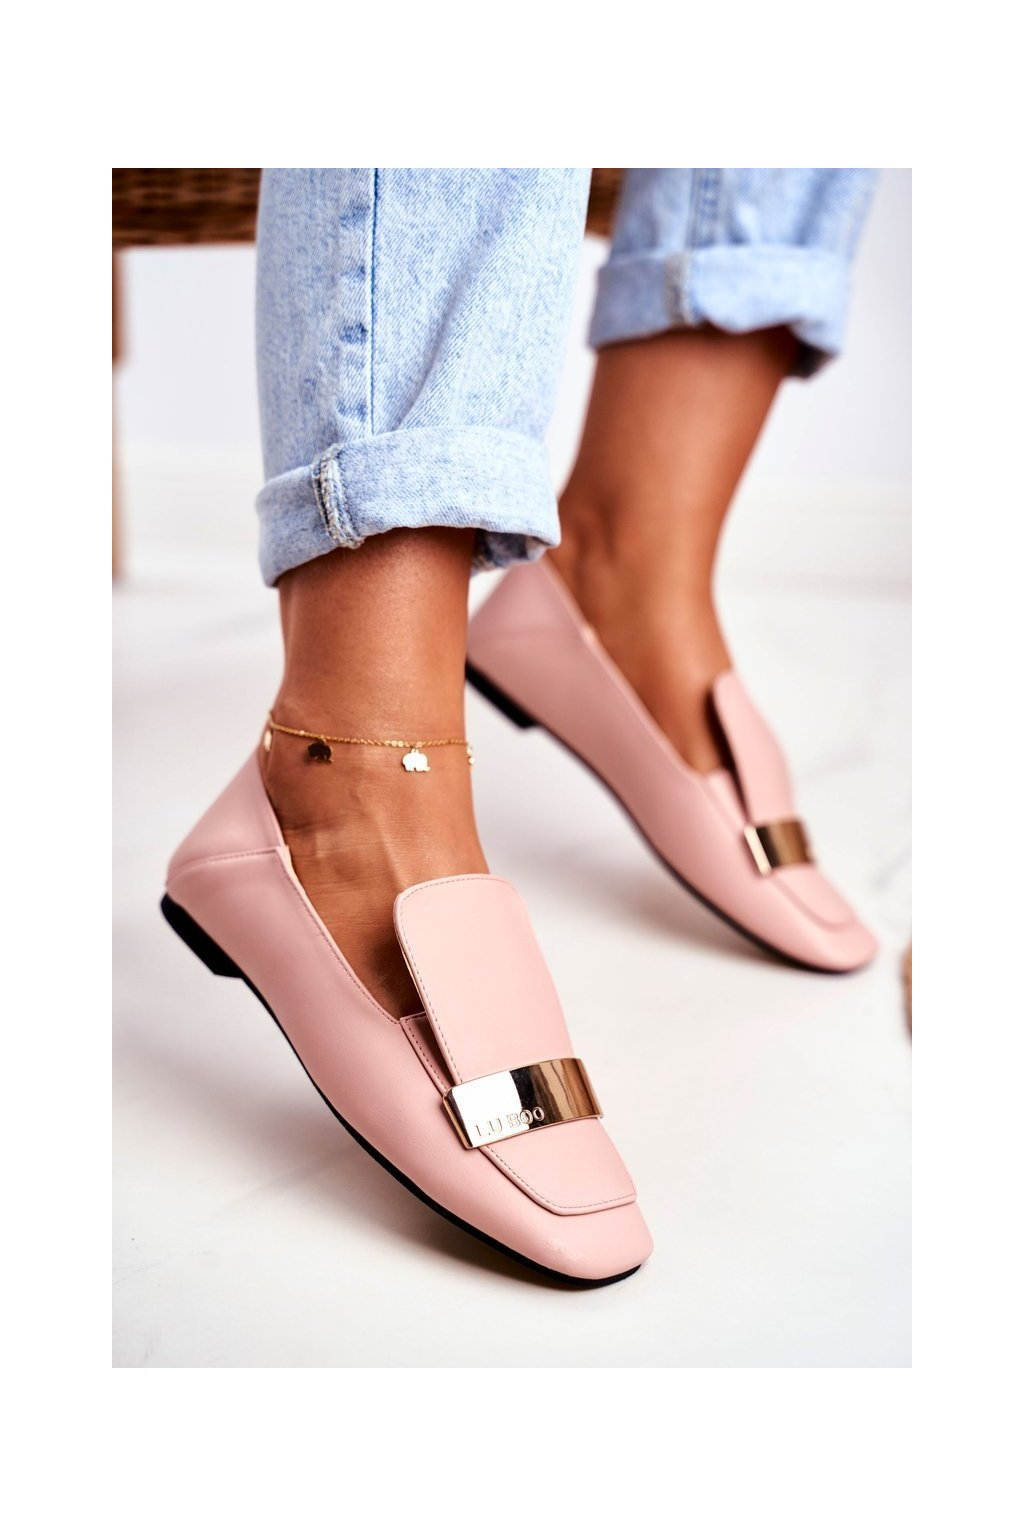 Ružová obuv kód topánok 588C-1 PU PINK